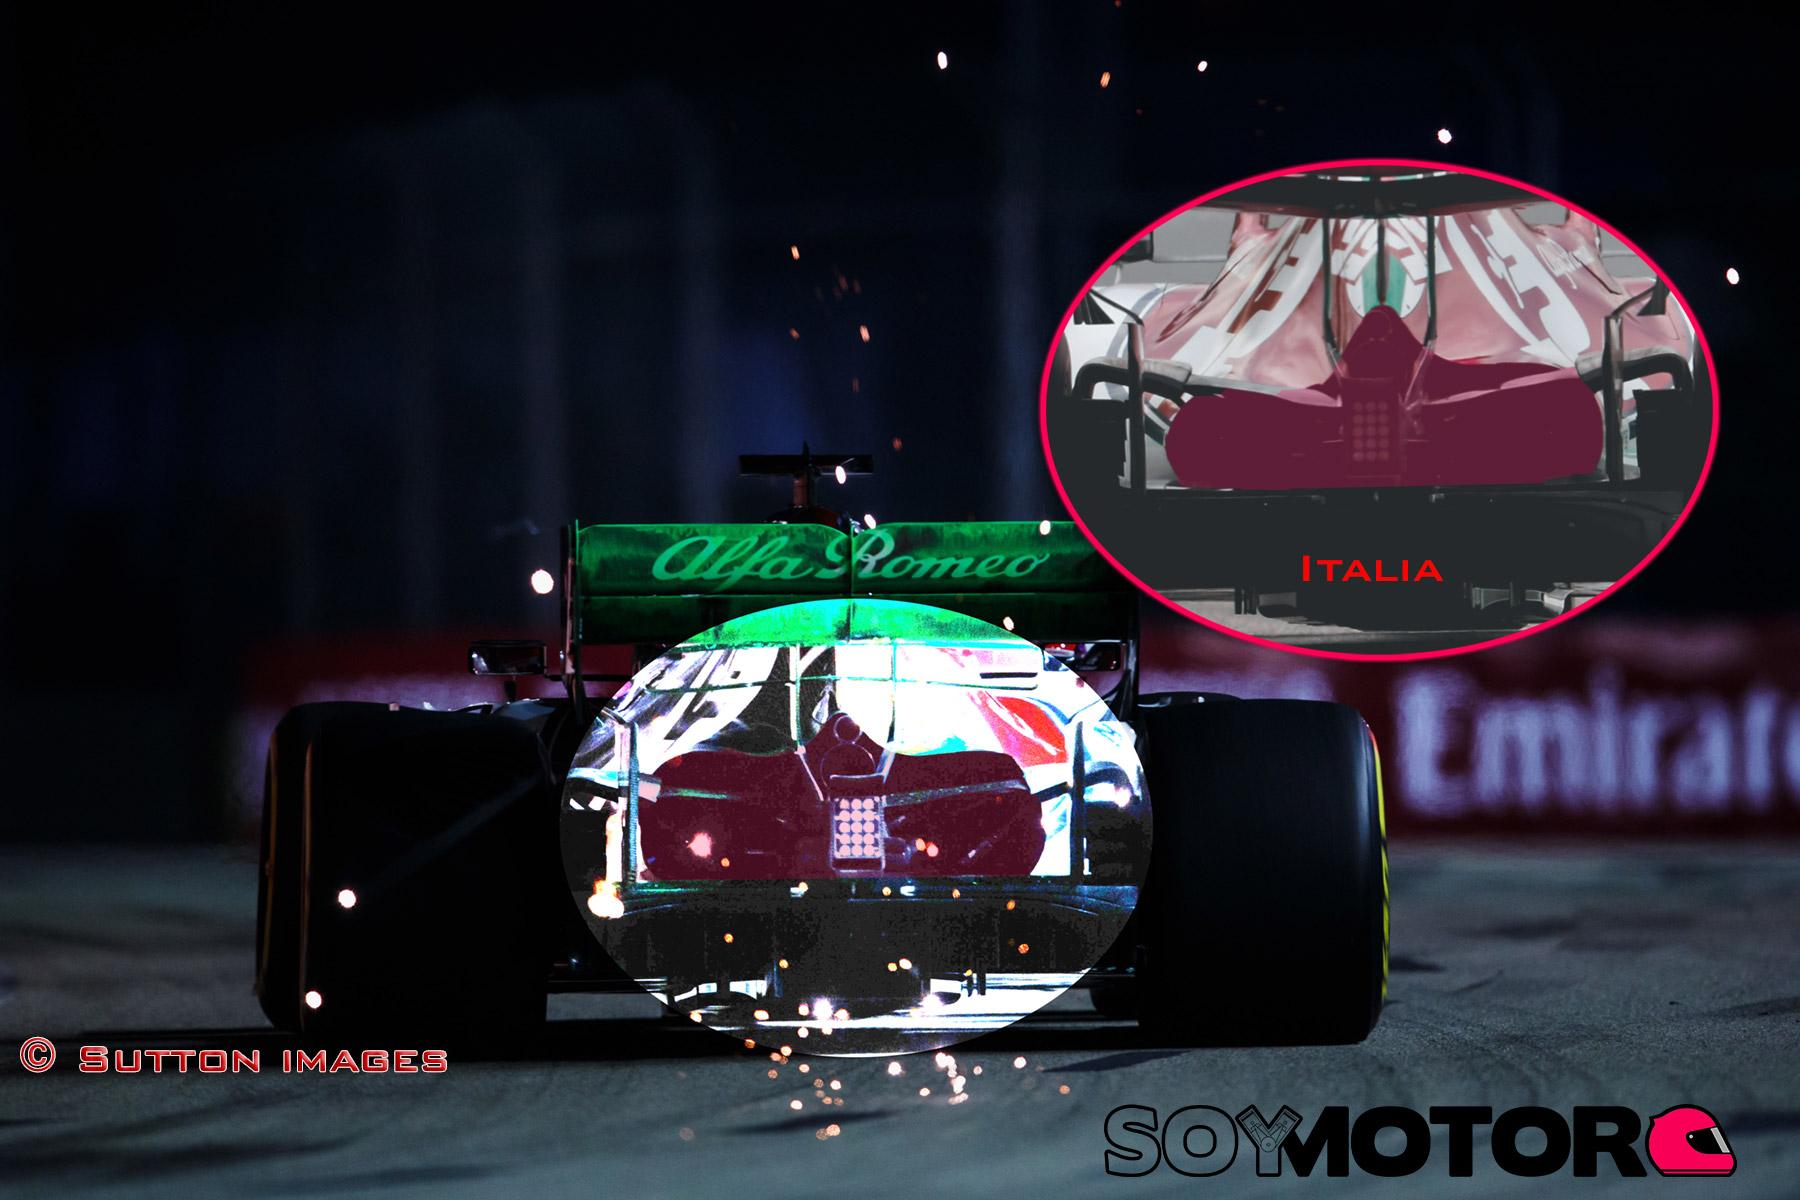 alfa-romeo-salida-posterior-soymotor.jpg